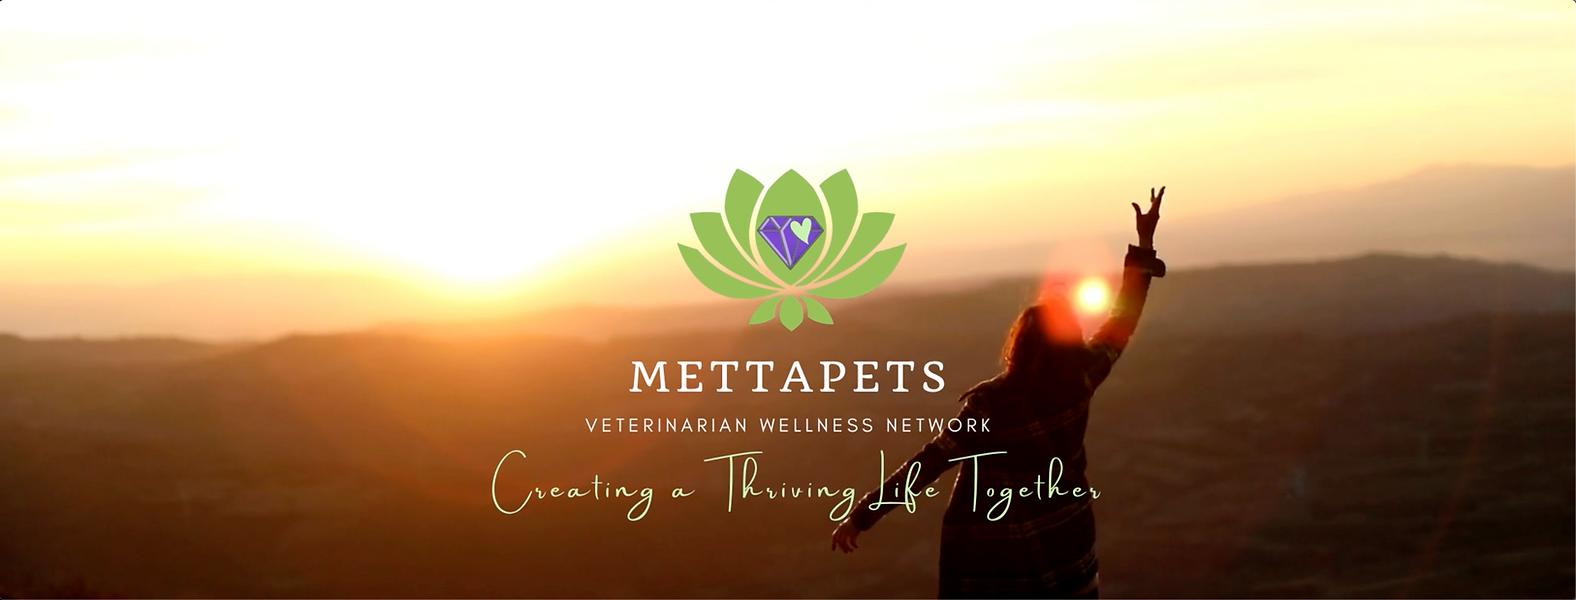 Mettapets veterinarian wellness network